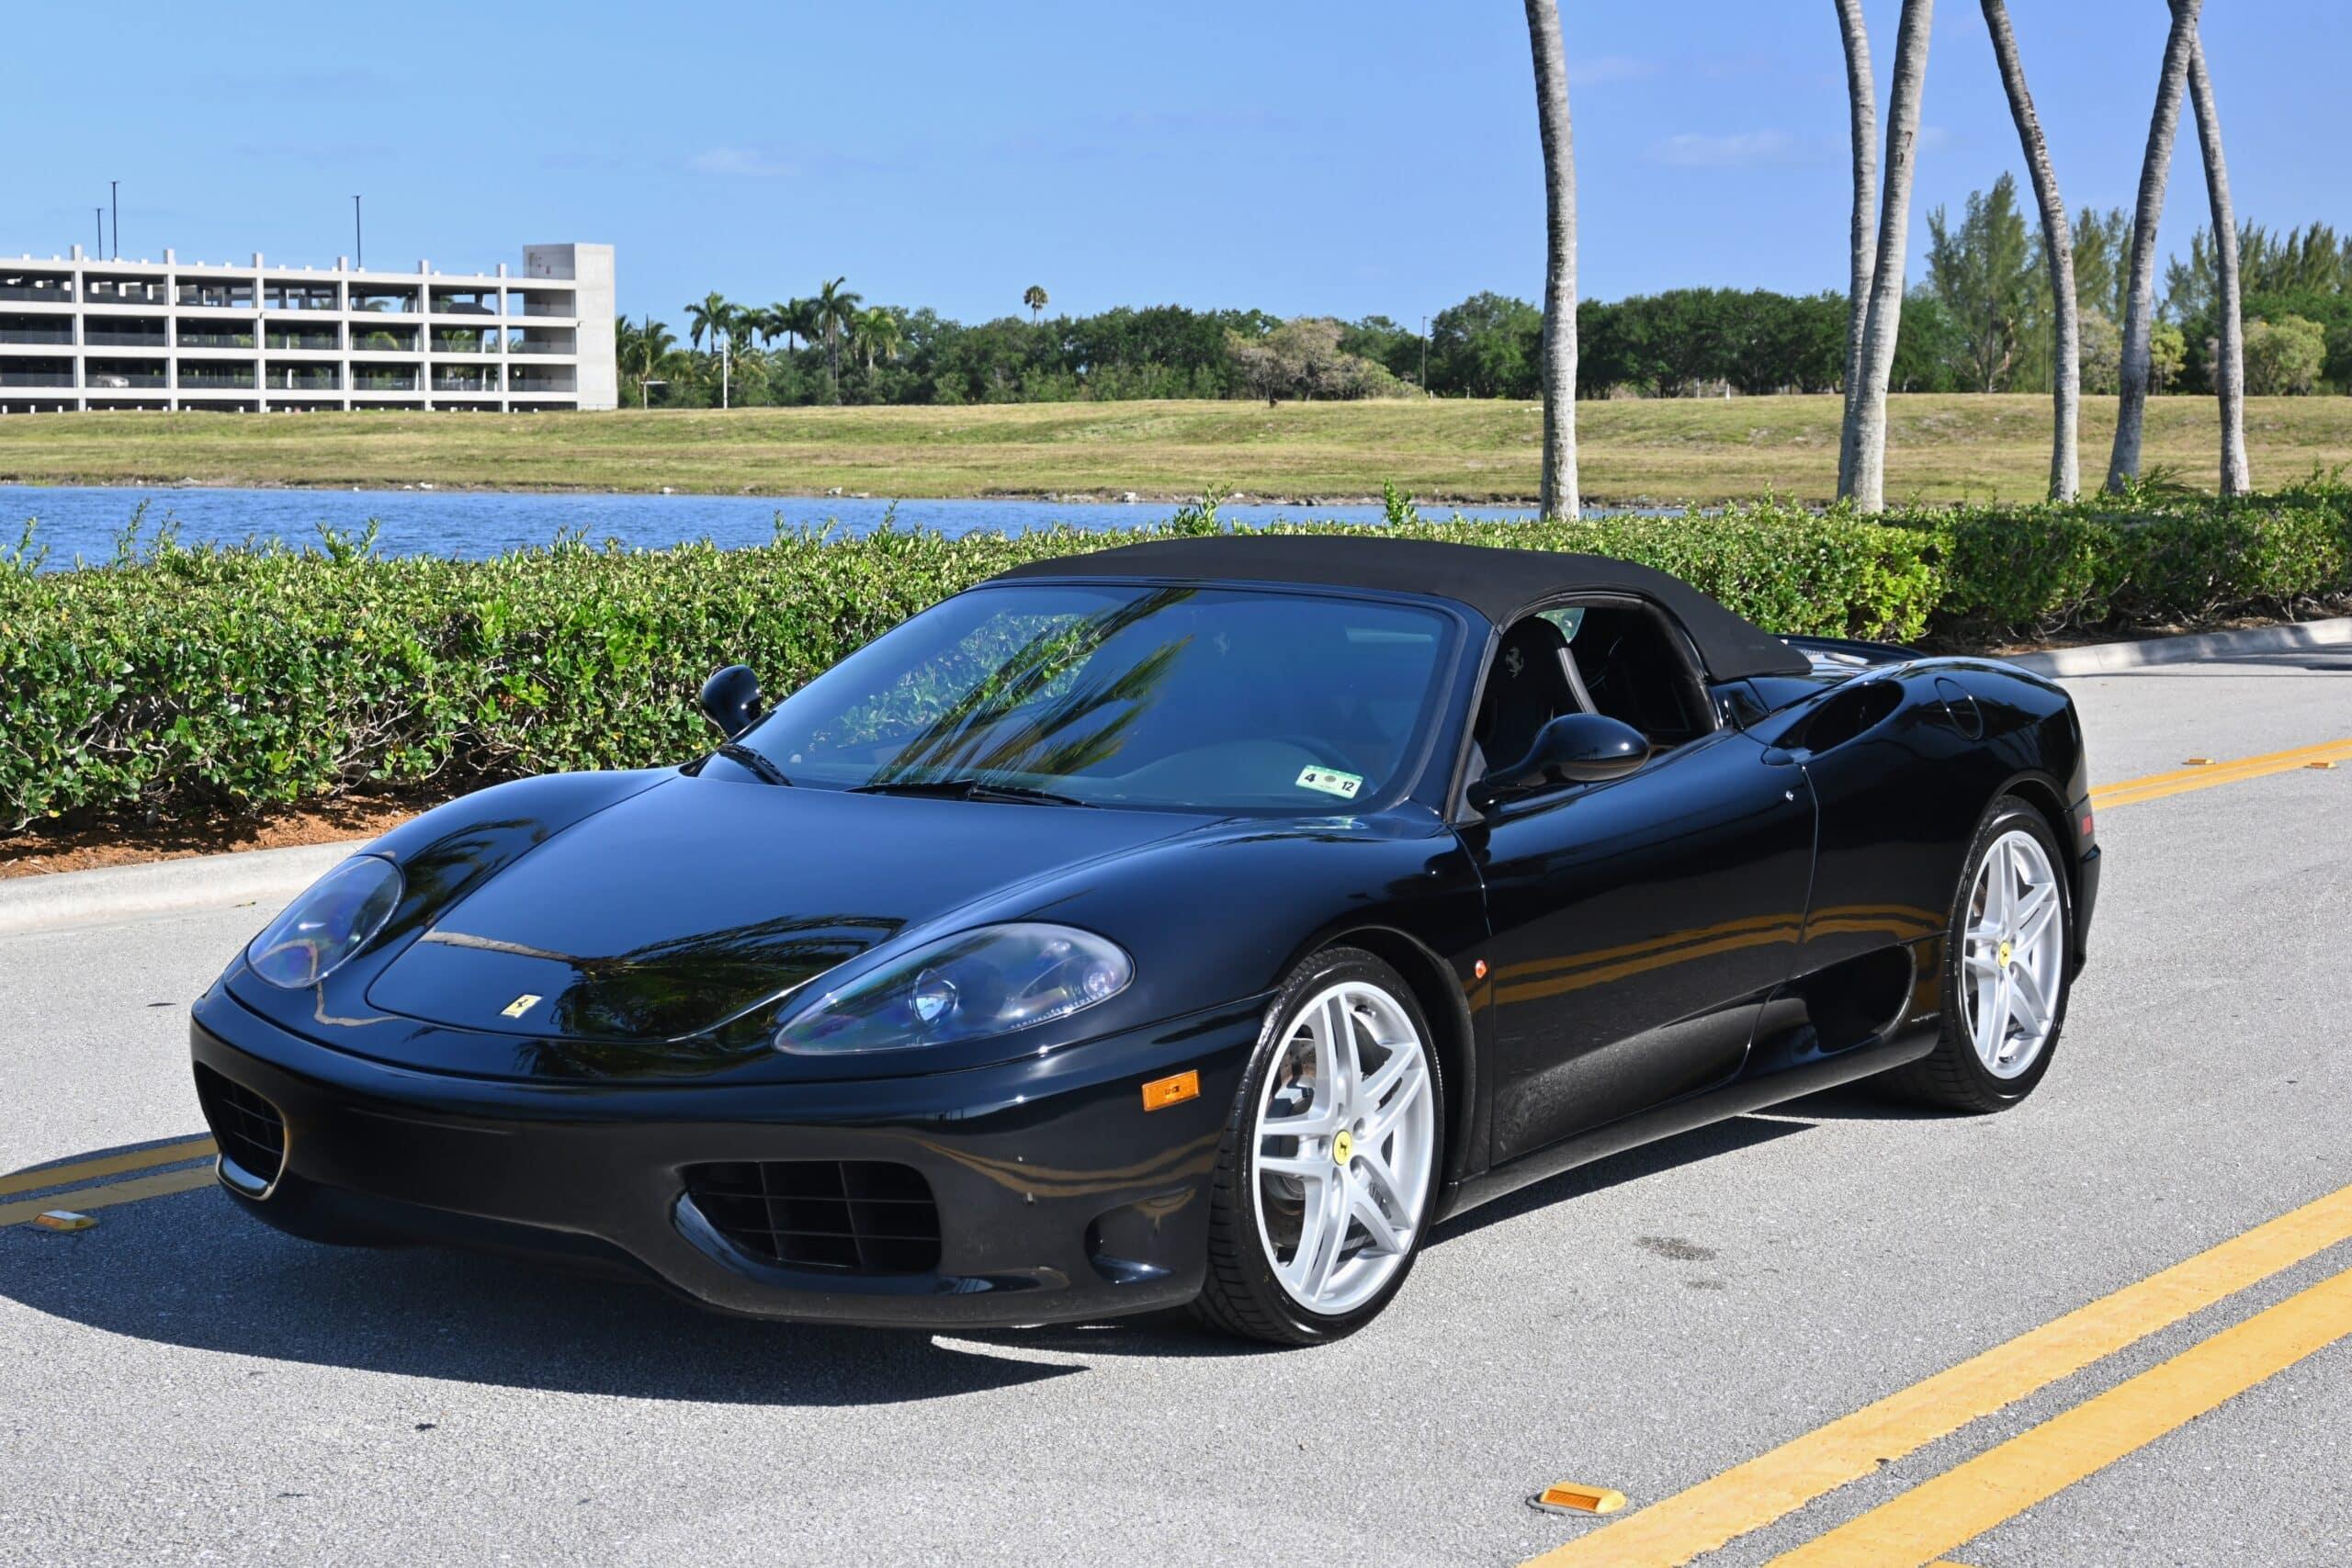 2001 Ferrari 360 Spider Boost Logic TWIN TURBO 550+HP- Fresh Belt Service- Clean Carfax- Service Records